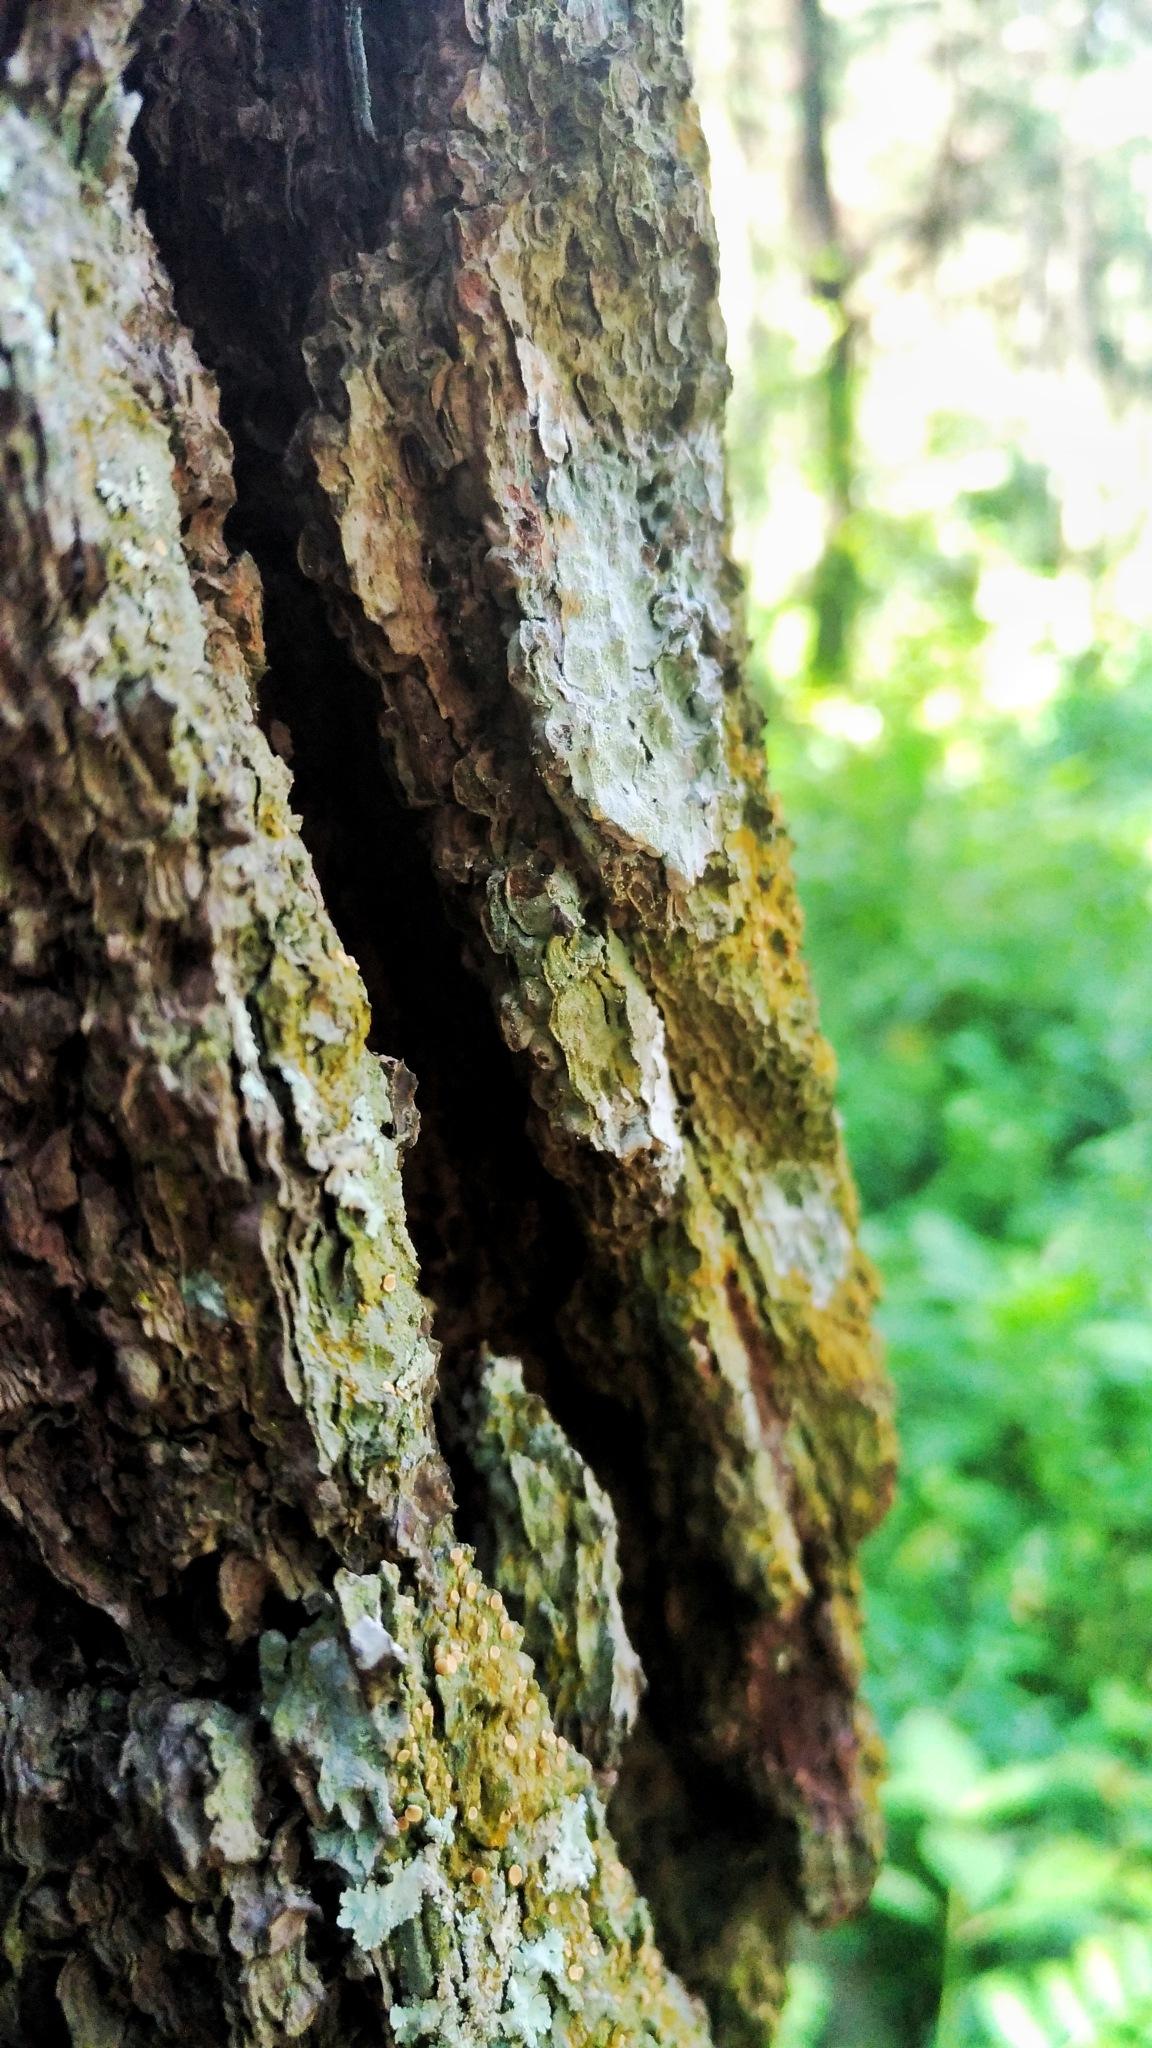 Tree by Bavner Donaldo